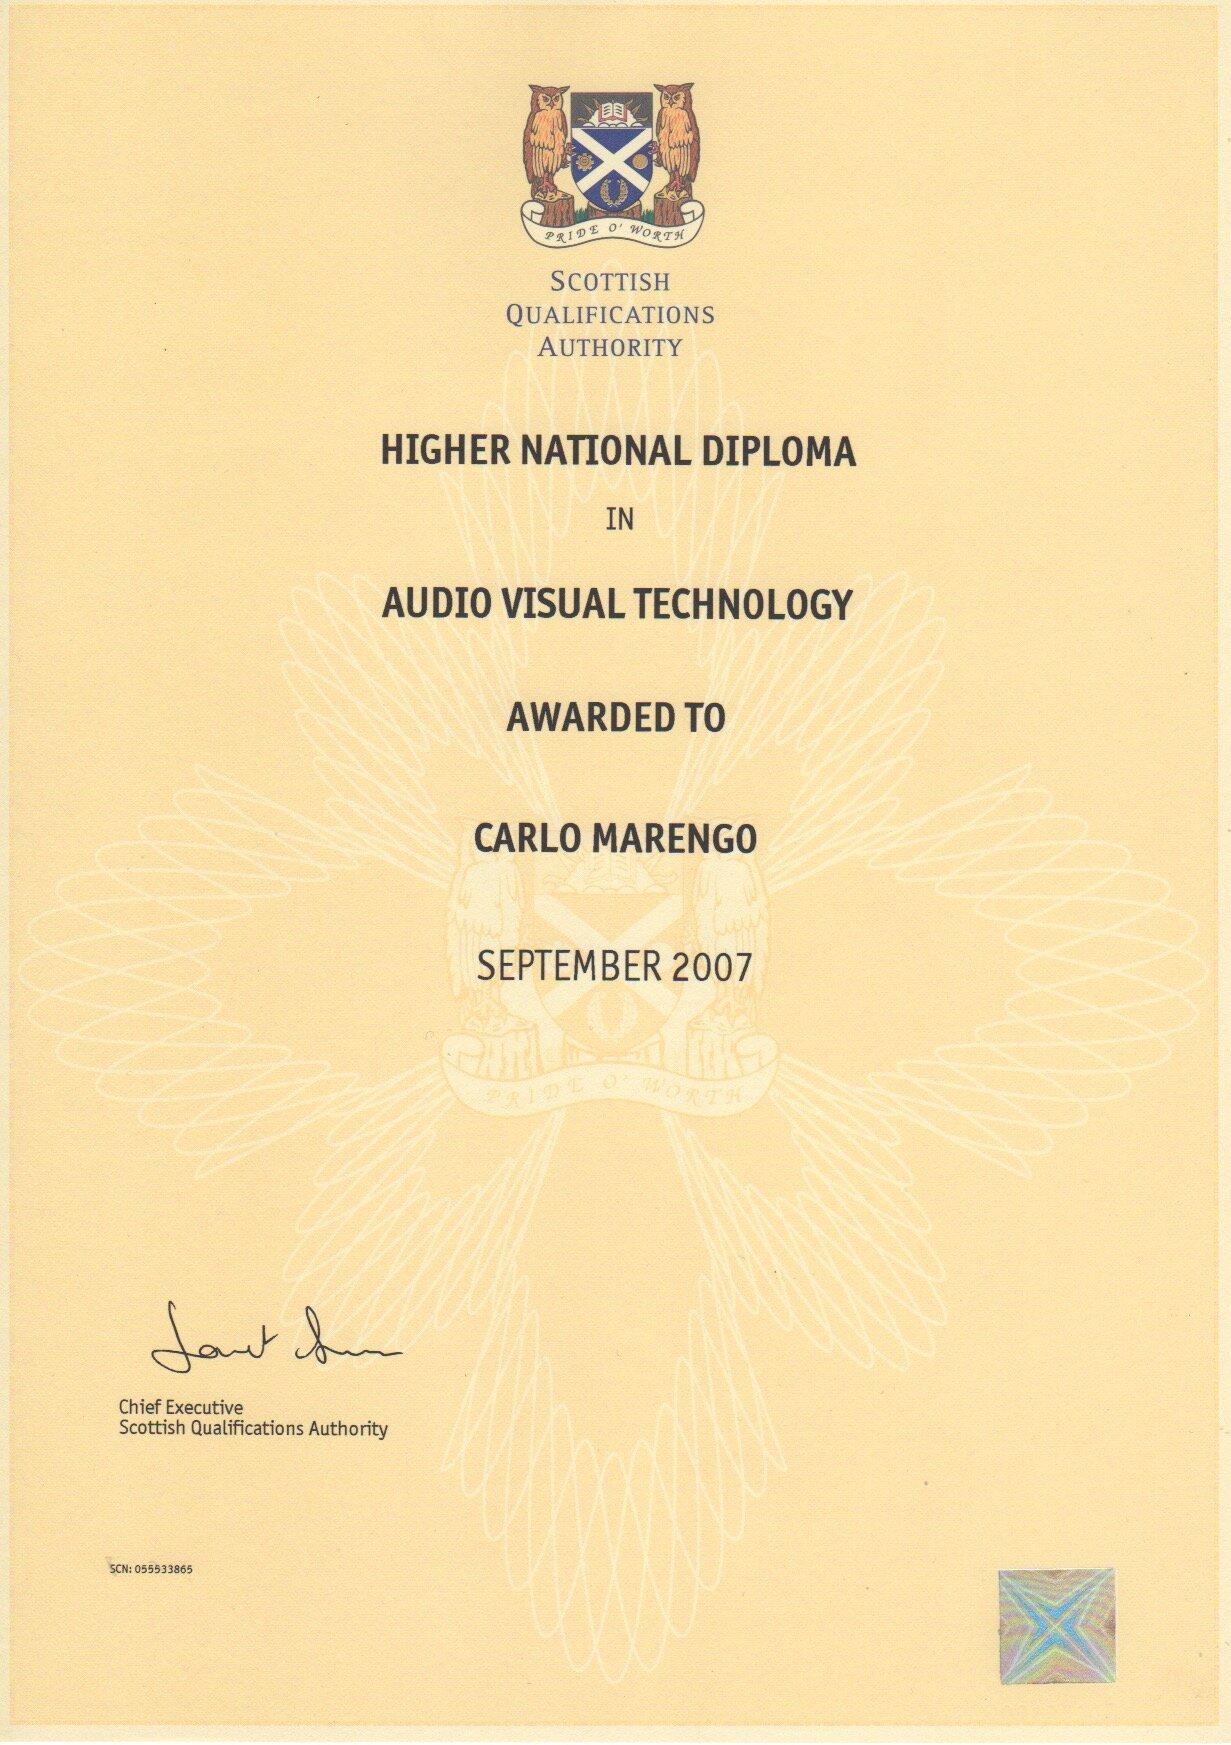 carlo-marengo-hnd-diploma.jpeg